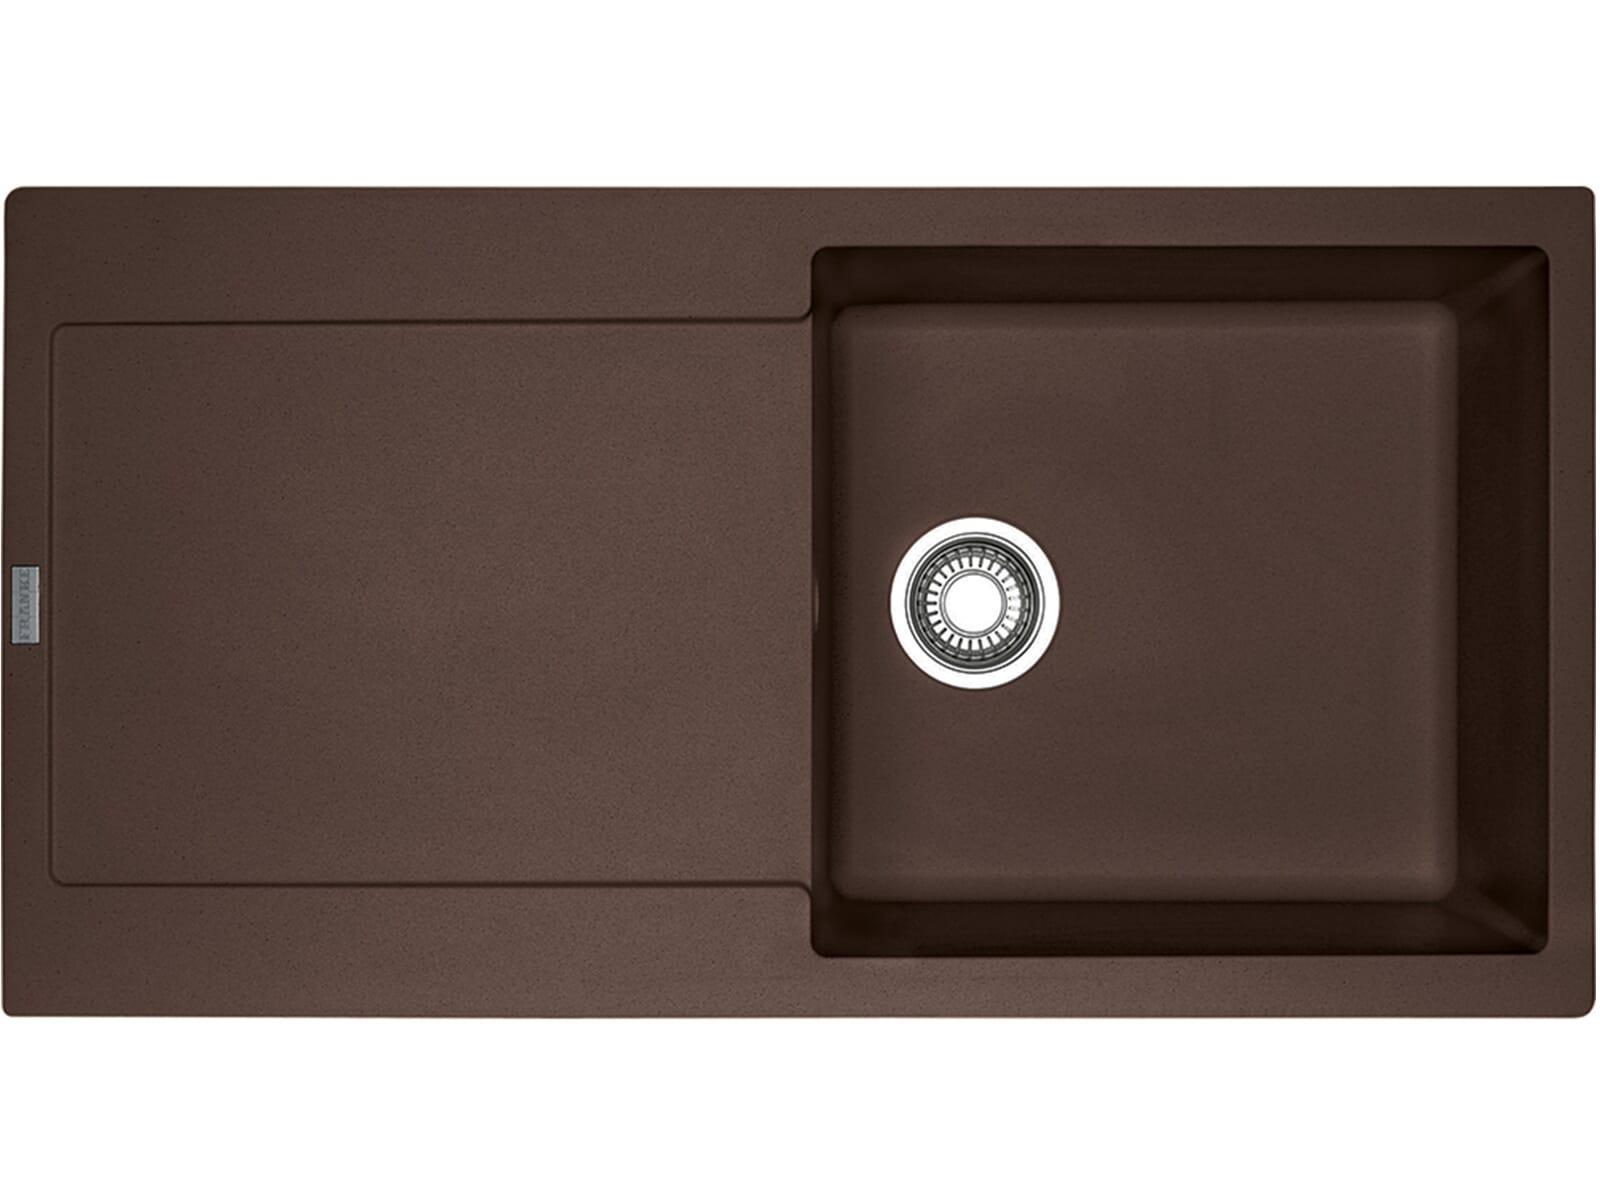 Franke Maris MRG 611 Chocolate - 114.0477.363 Granitspüle Exzenterbetätigung